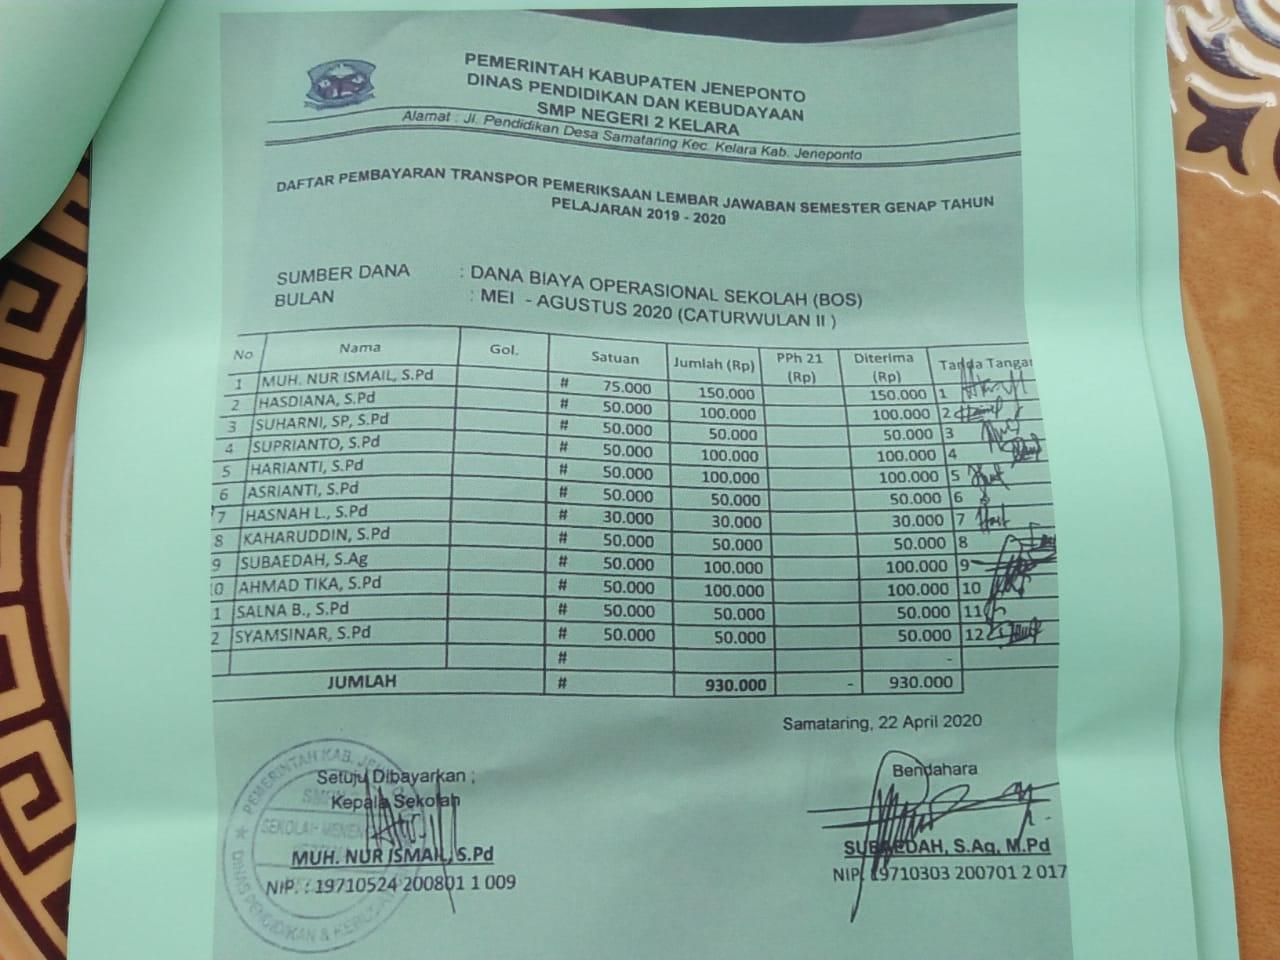 Tim Irban IV Inspektorat Dalami Dugaan Pemotongan Gaji Dan Pemalsuan Tanda Tangan Guru Non PNS SMPN 2 Kelara